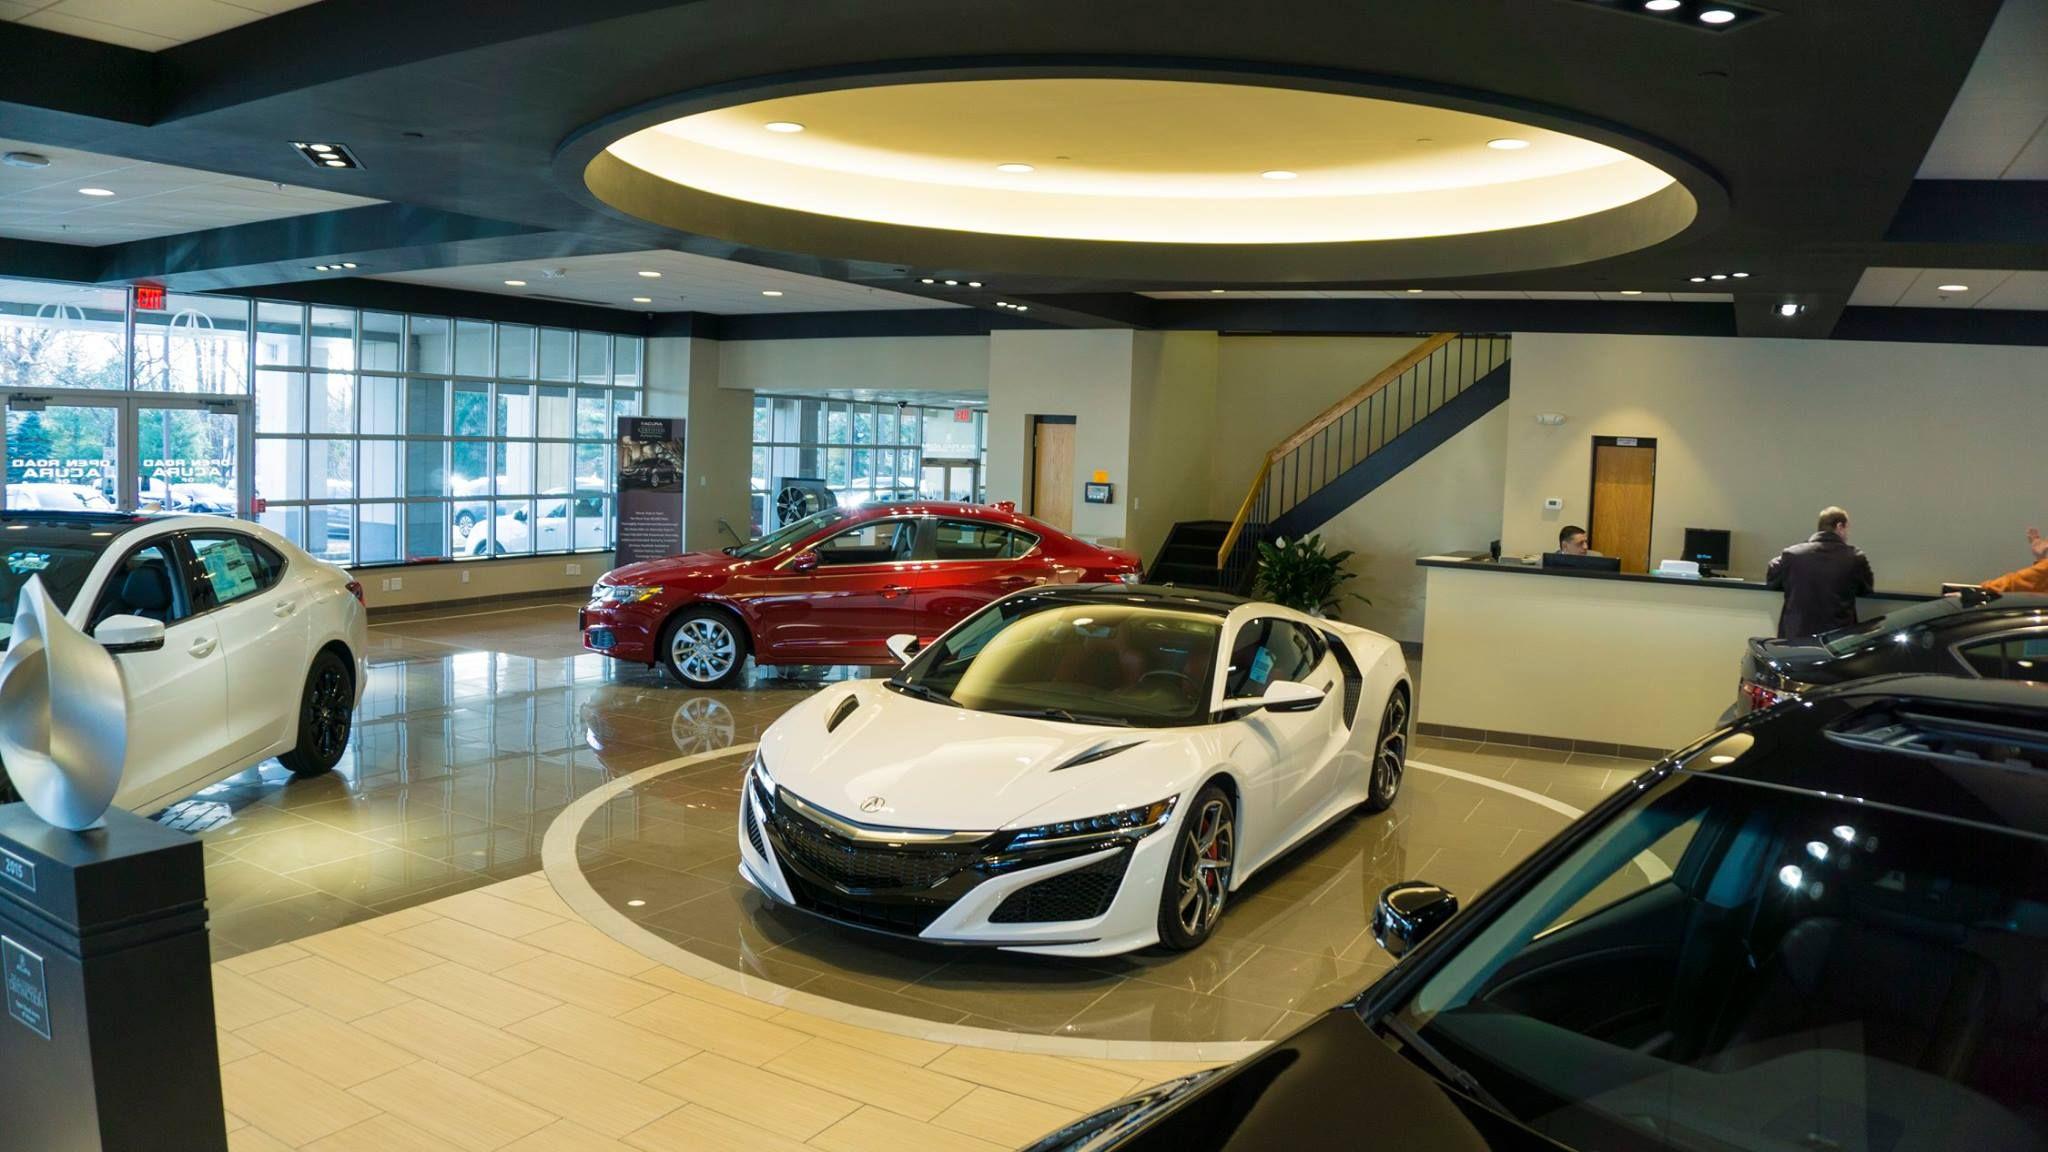 Jersey Tile L L C Acura Dealership Wayne Nj Image Proview